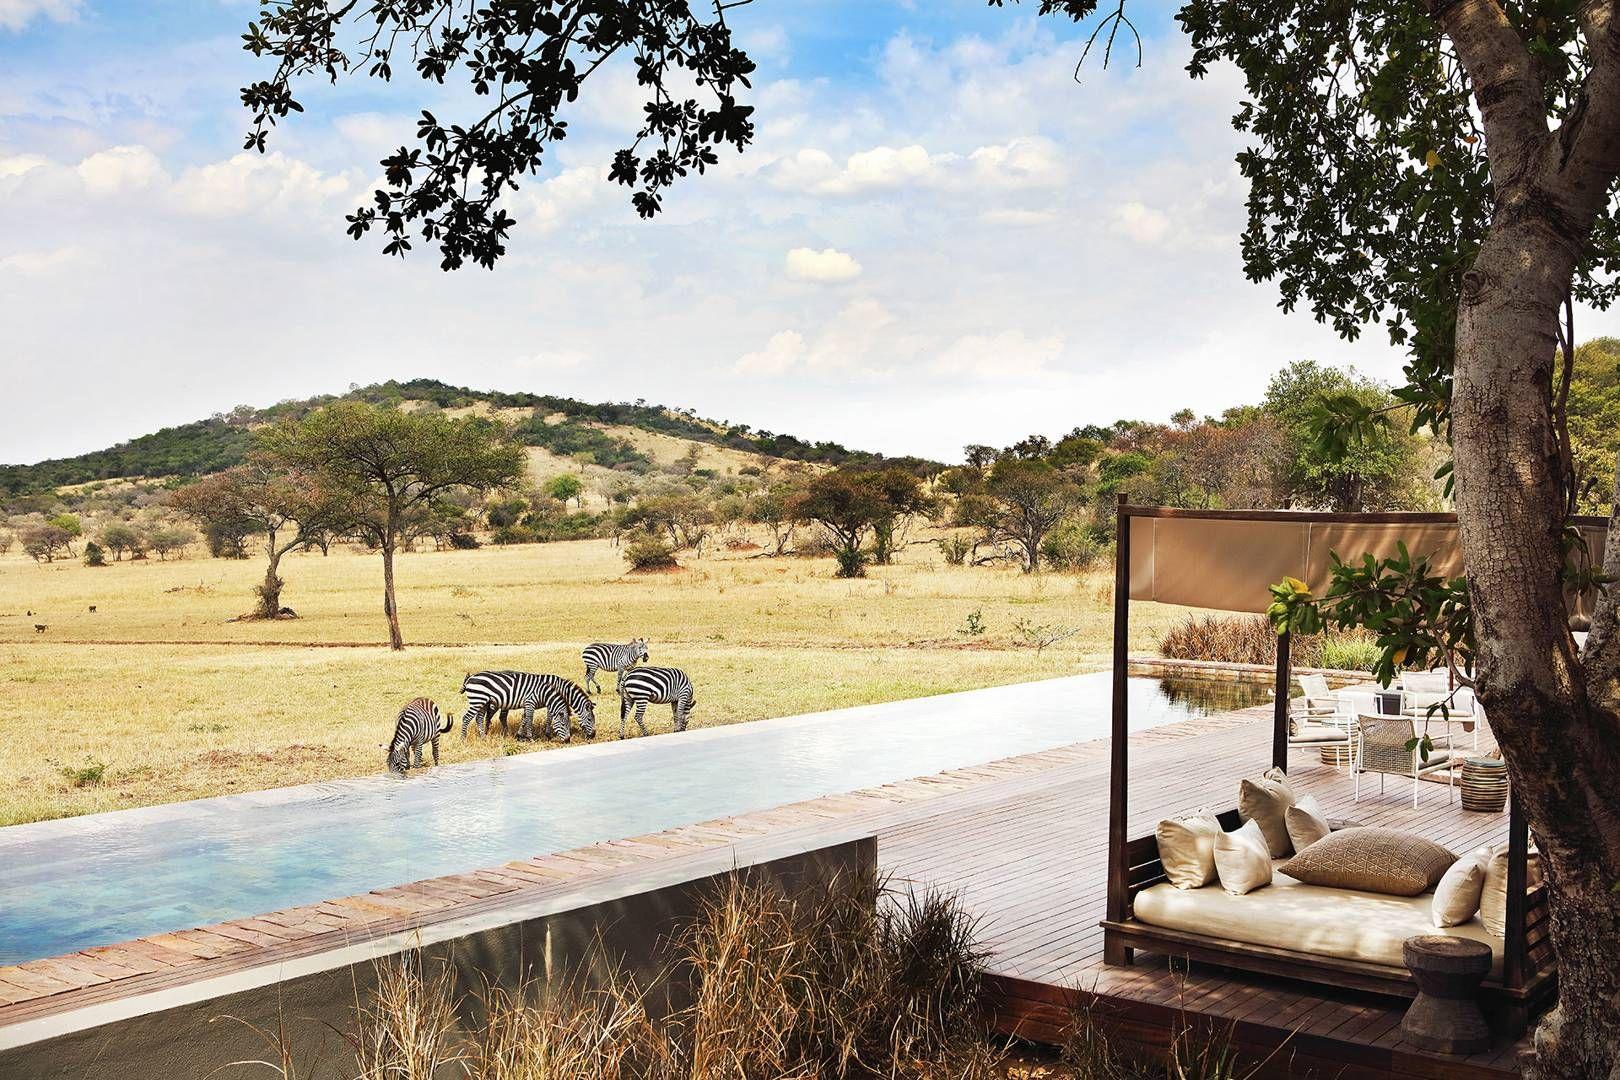 Destinations Tatler's Travel Editor Is Dreaming Of: Singita Grumeti Reserve, Tanzania